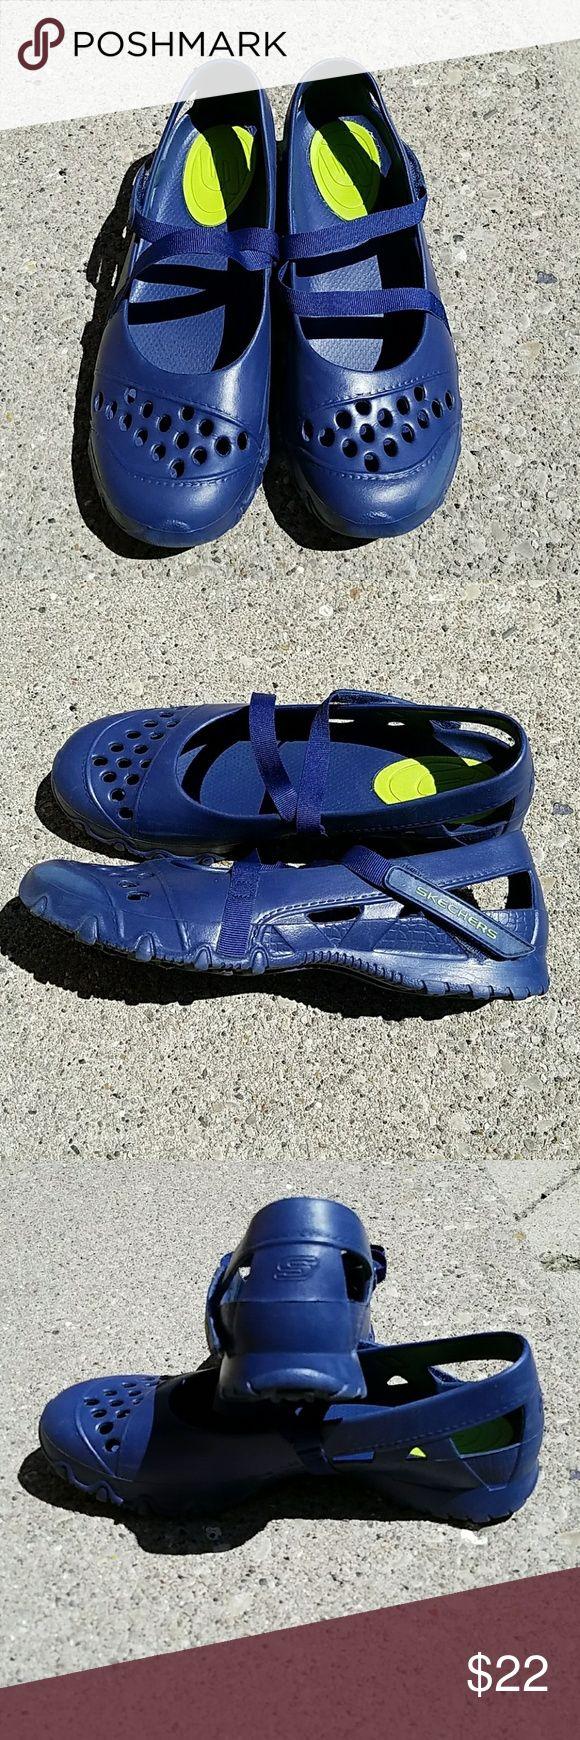 Foam Sketchers Sneakers Velcro Strap. In good condition. Sole is not run down. Skechers Shoes Sneakers